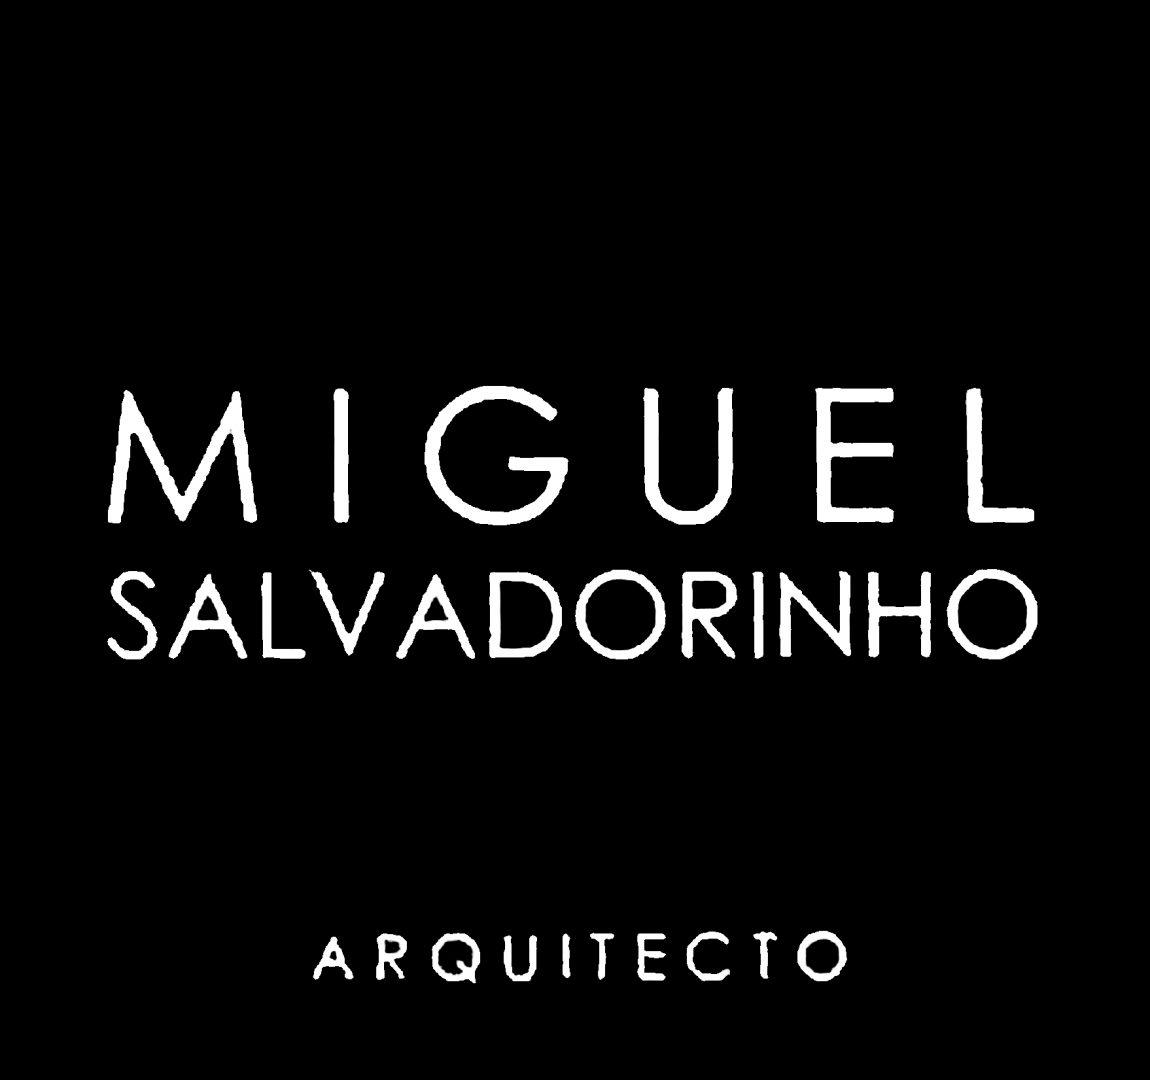 Arq. Miguel Salvadorinho